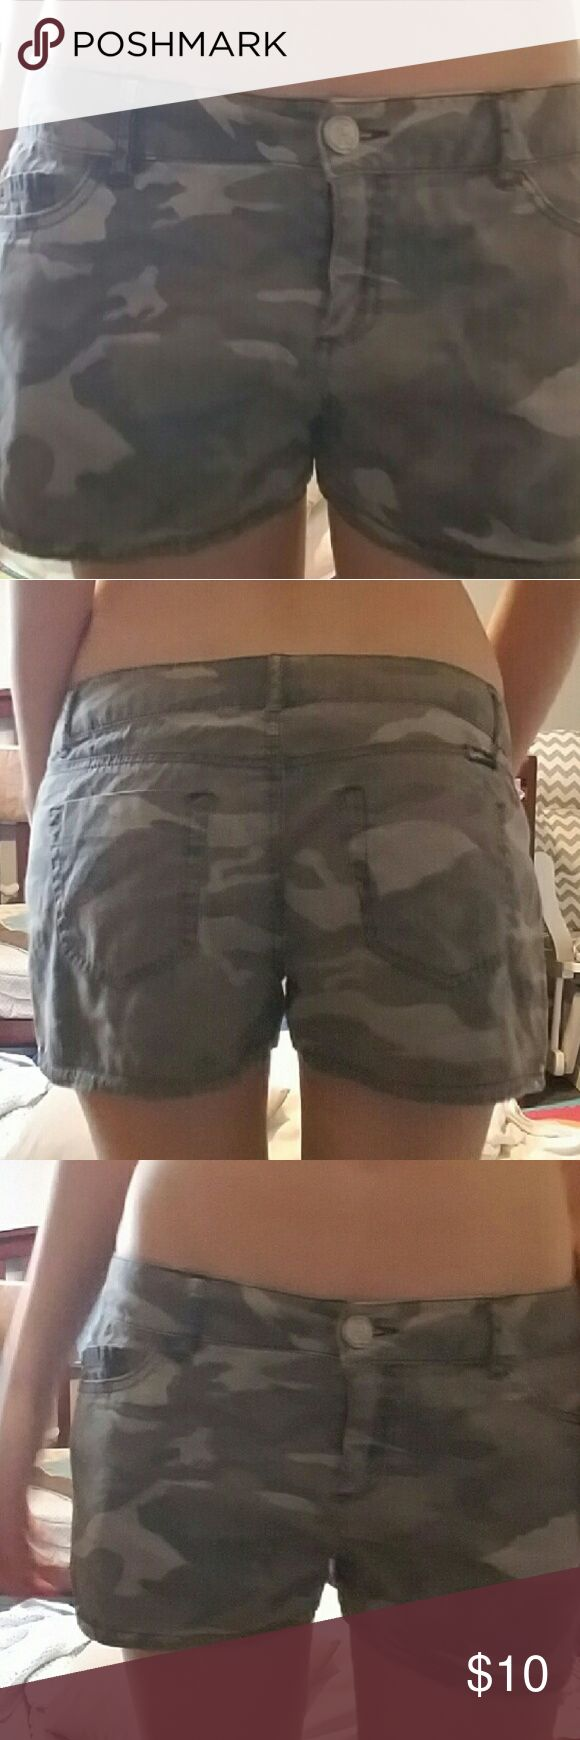 Camouflage shorts Camouflage shorts size 6 Shorts